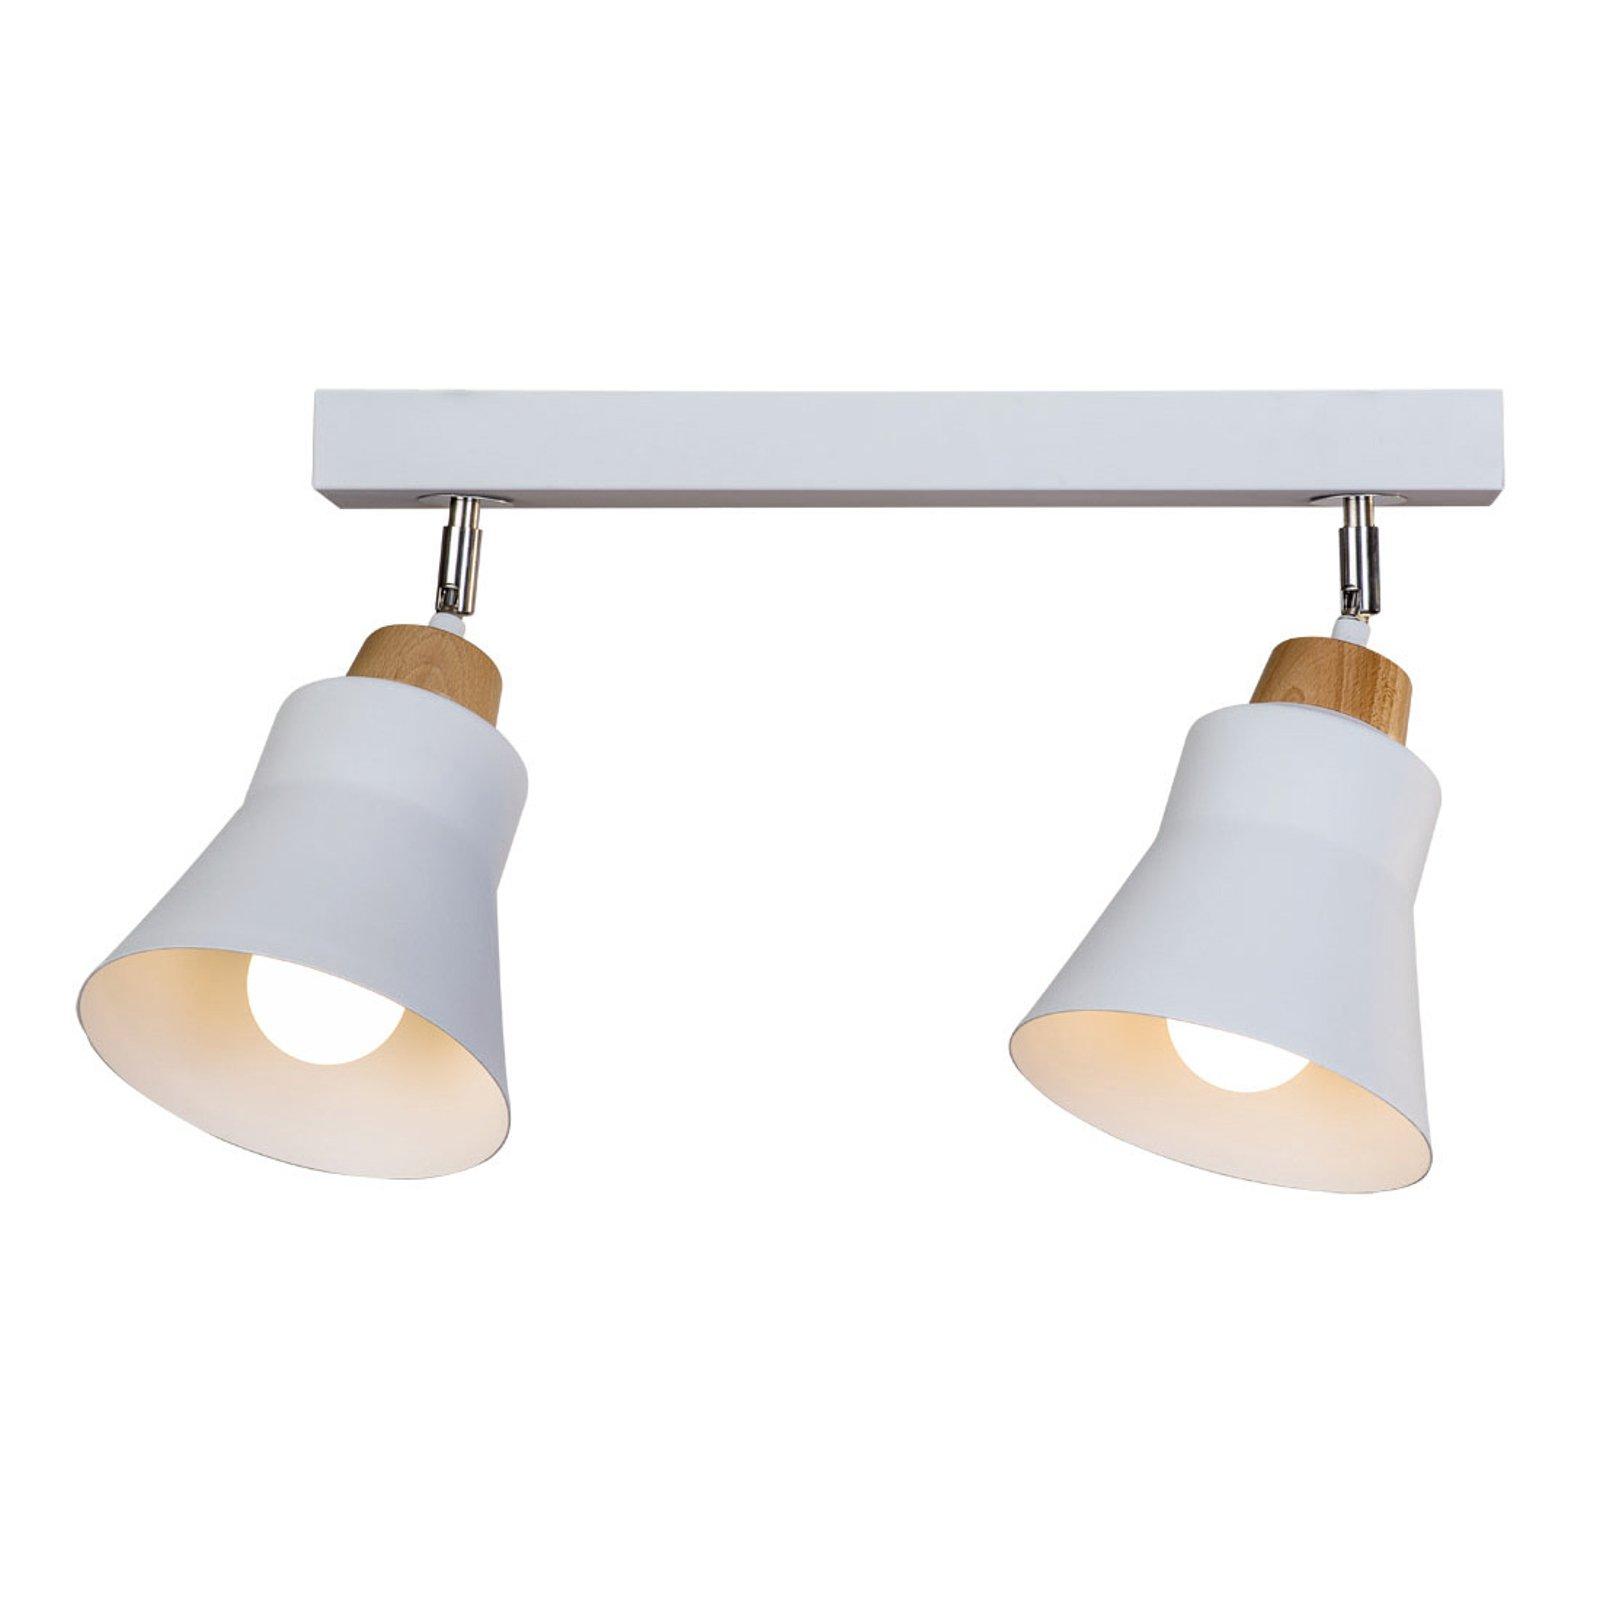 Wood taklampe, 2 lyskilder, hvit